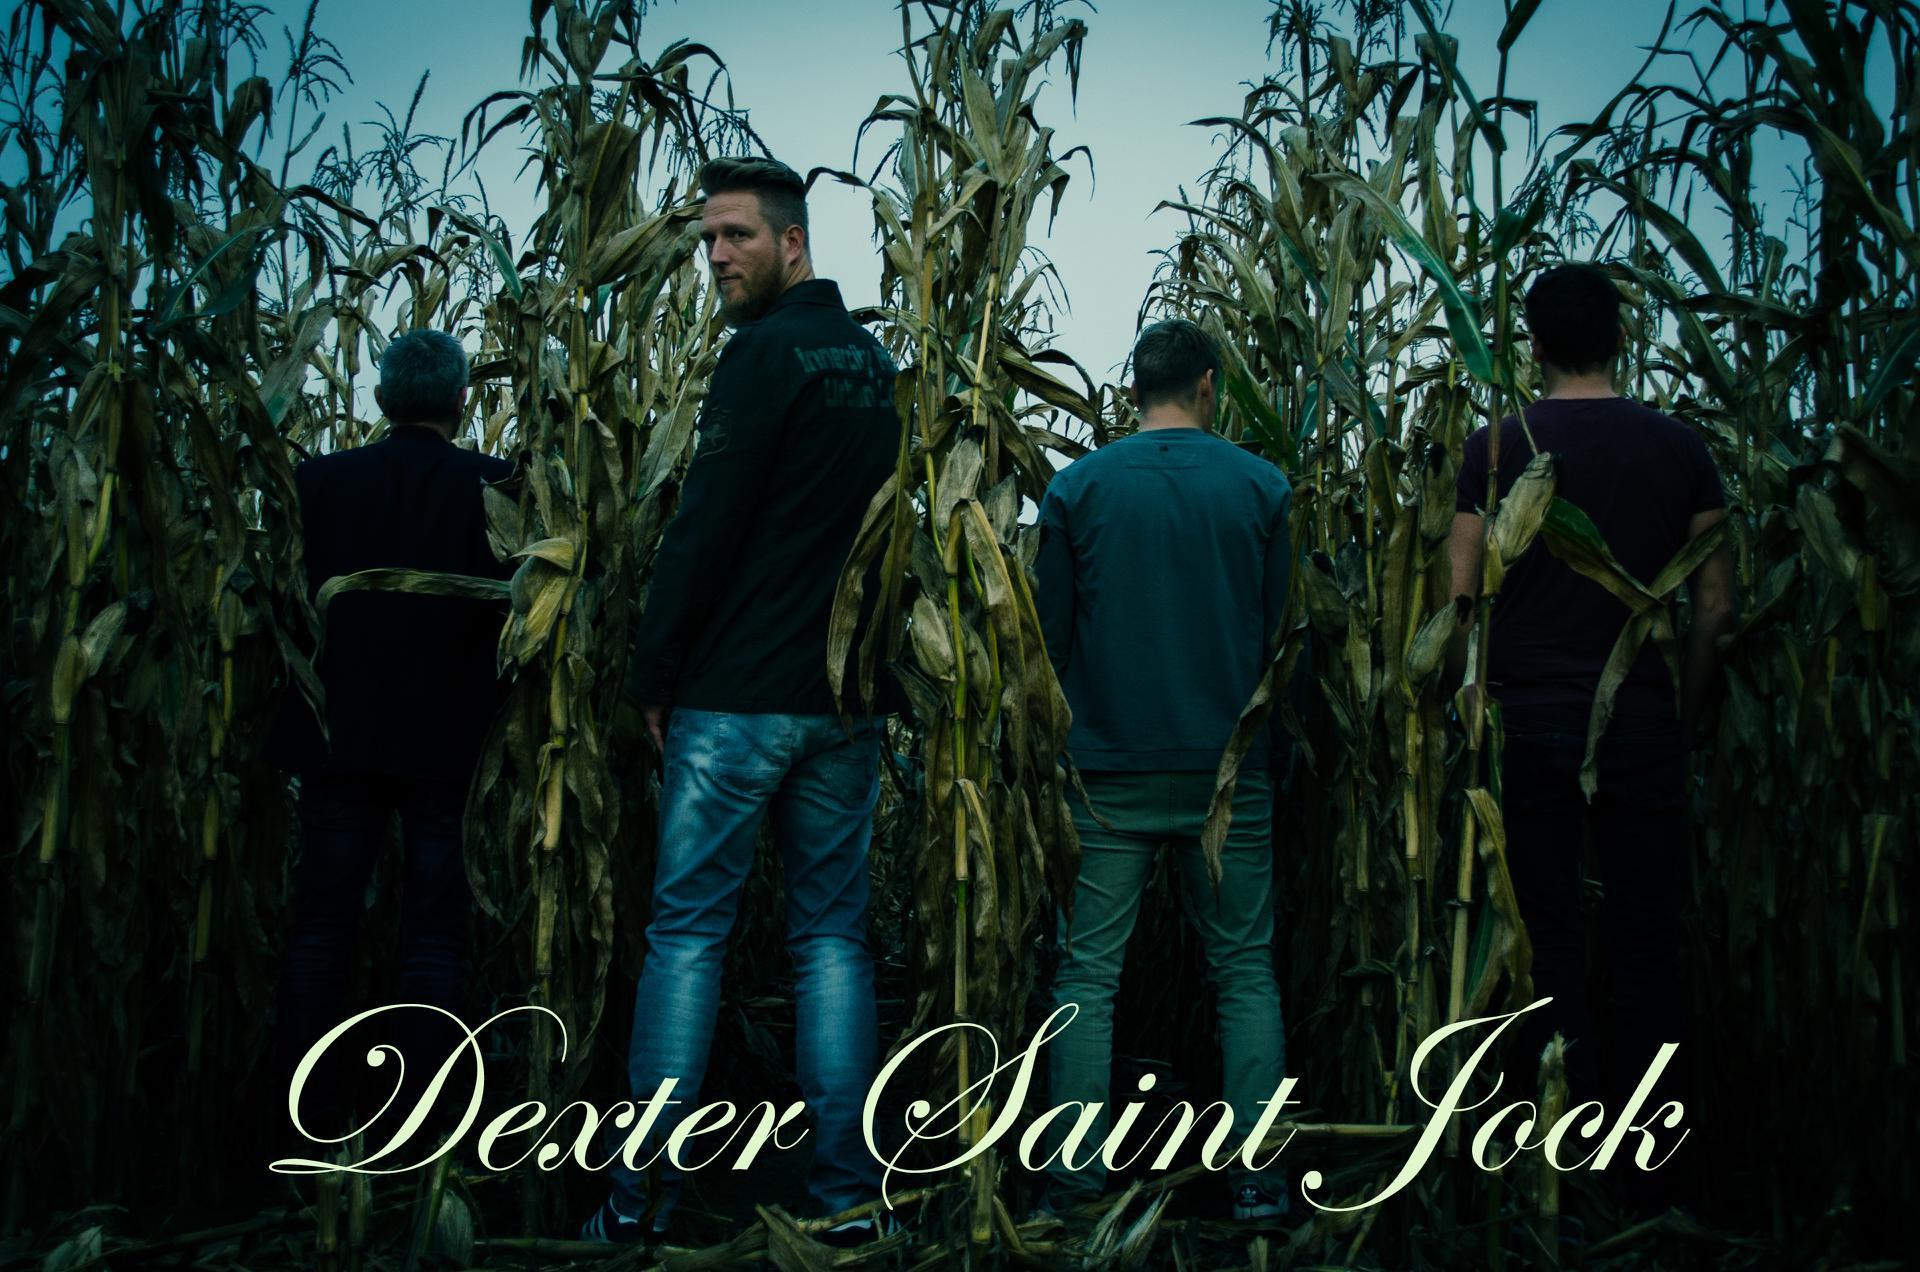 Dexter Saint Jock